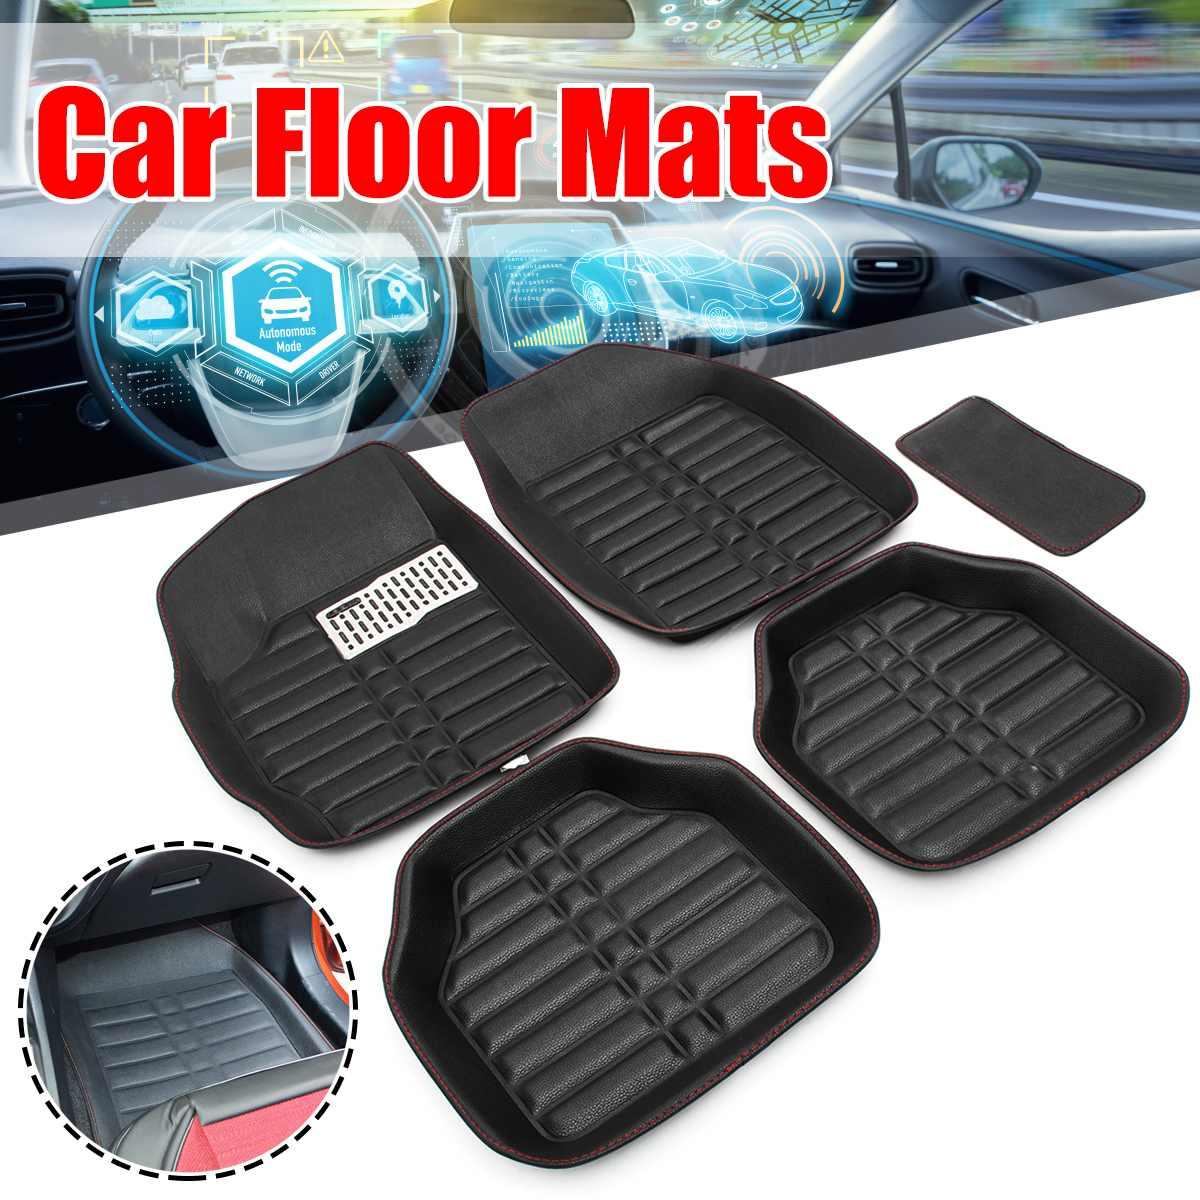 5Pcs Universal Car Floor Mats Front Rear Driver Passenger Seat Ridged Floor Mat Interior Carpet Heavy   Floor Protector floor